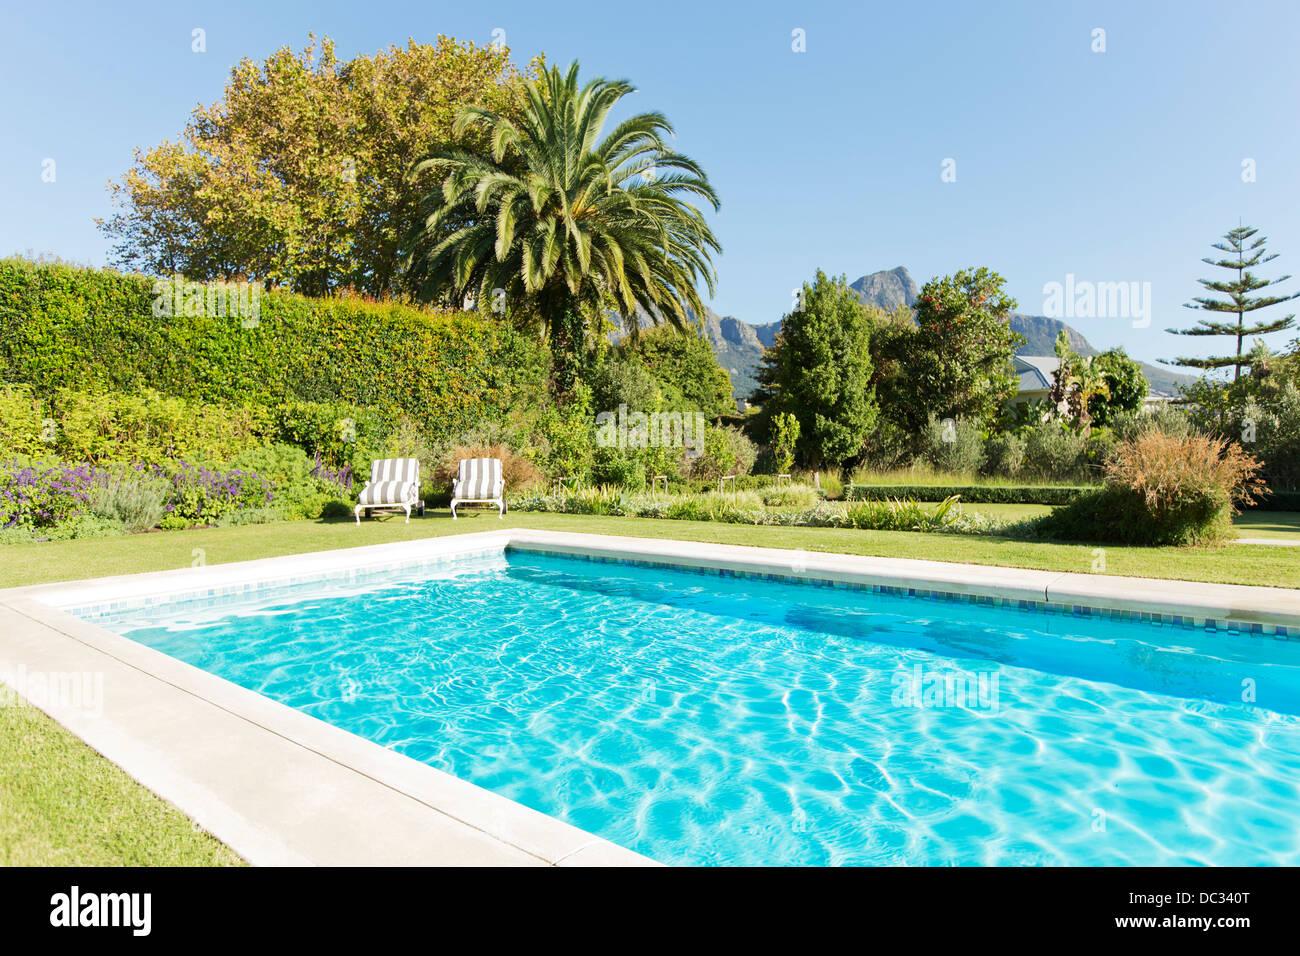 Luxury swimming pool and garden - Stock Image